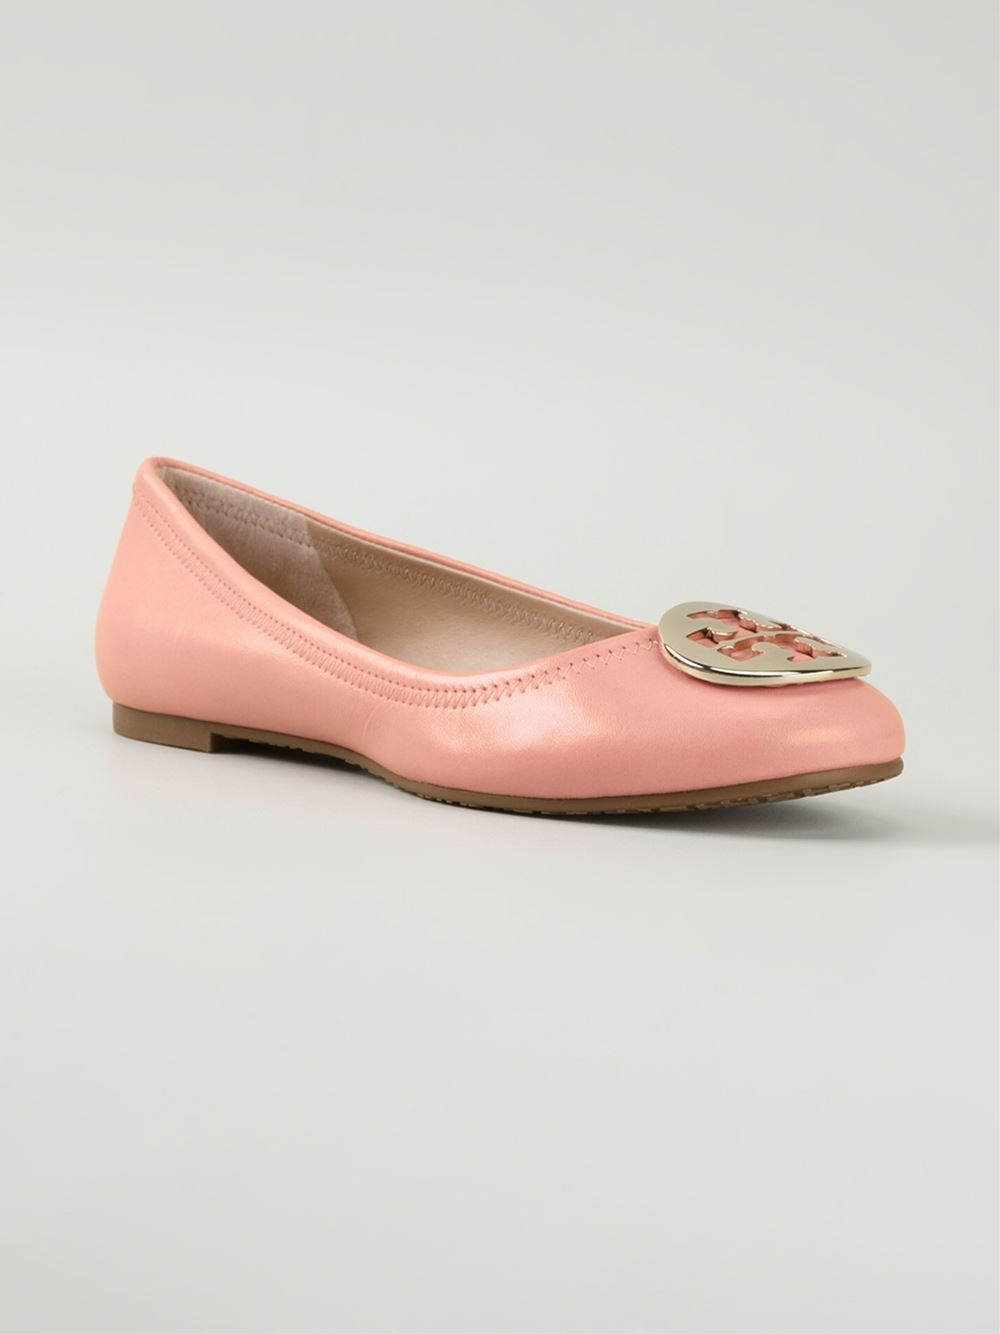 tory burch 39 reva ballet 39 ballerinas in pink pink purple lyst. Black Bedroom Furniture Sets. Home Design Ideas